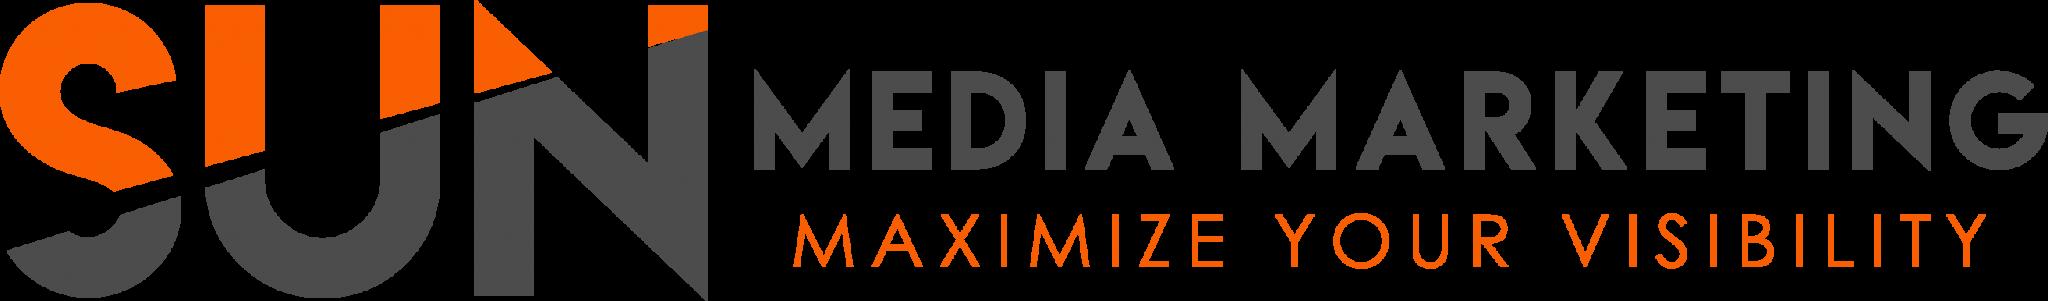 sun-media-marketing